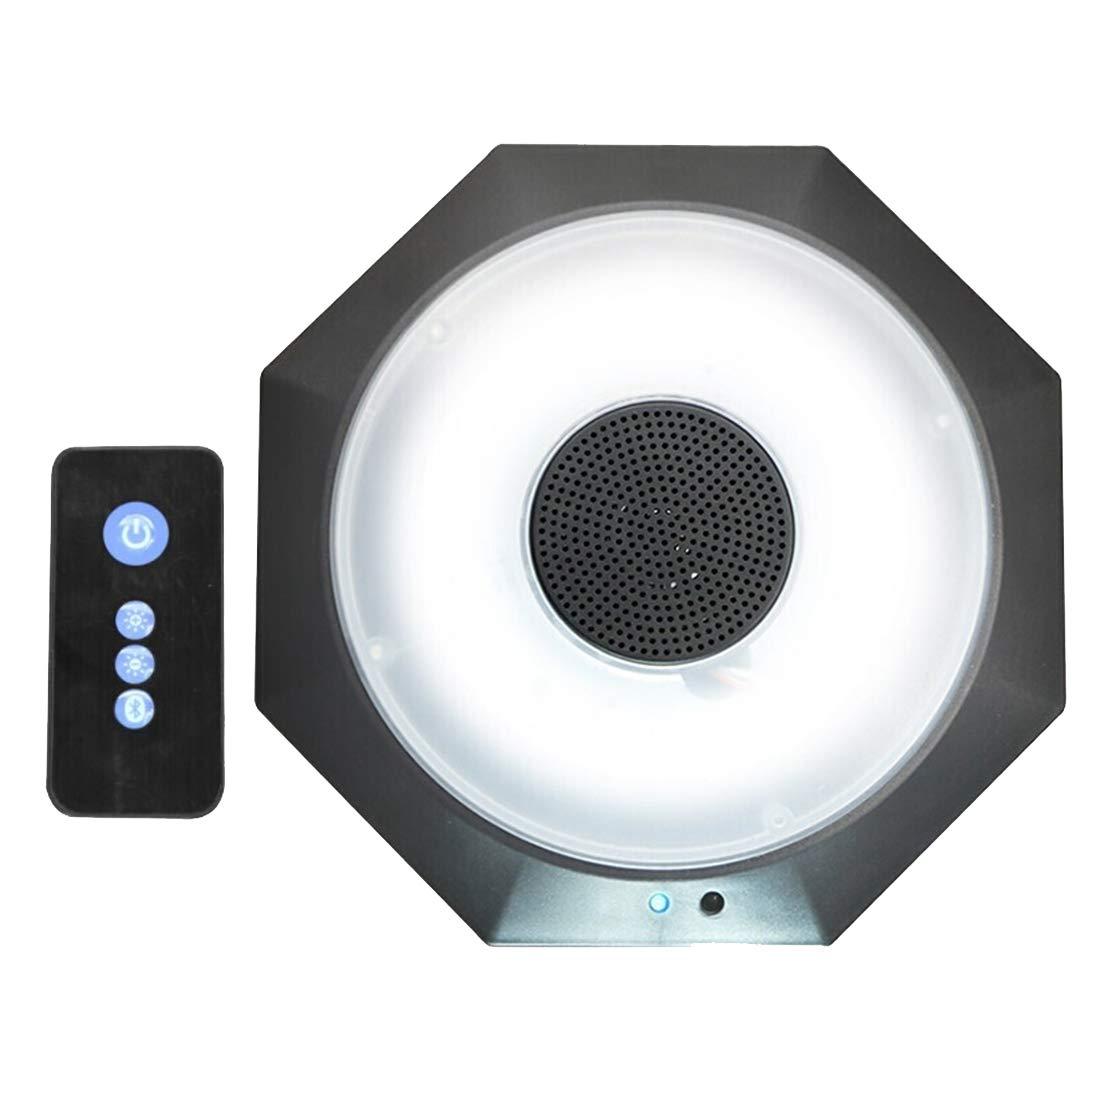 USB Charging LED Umbrella Light Roman Umbrella Hanging Lighting Bluetooth Speaker with Remote Control